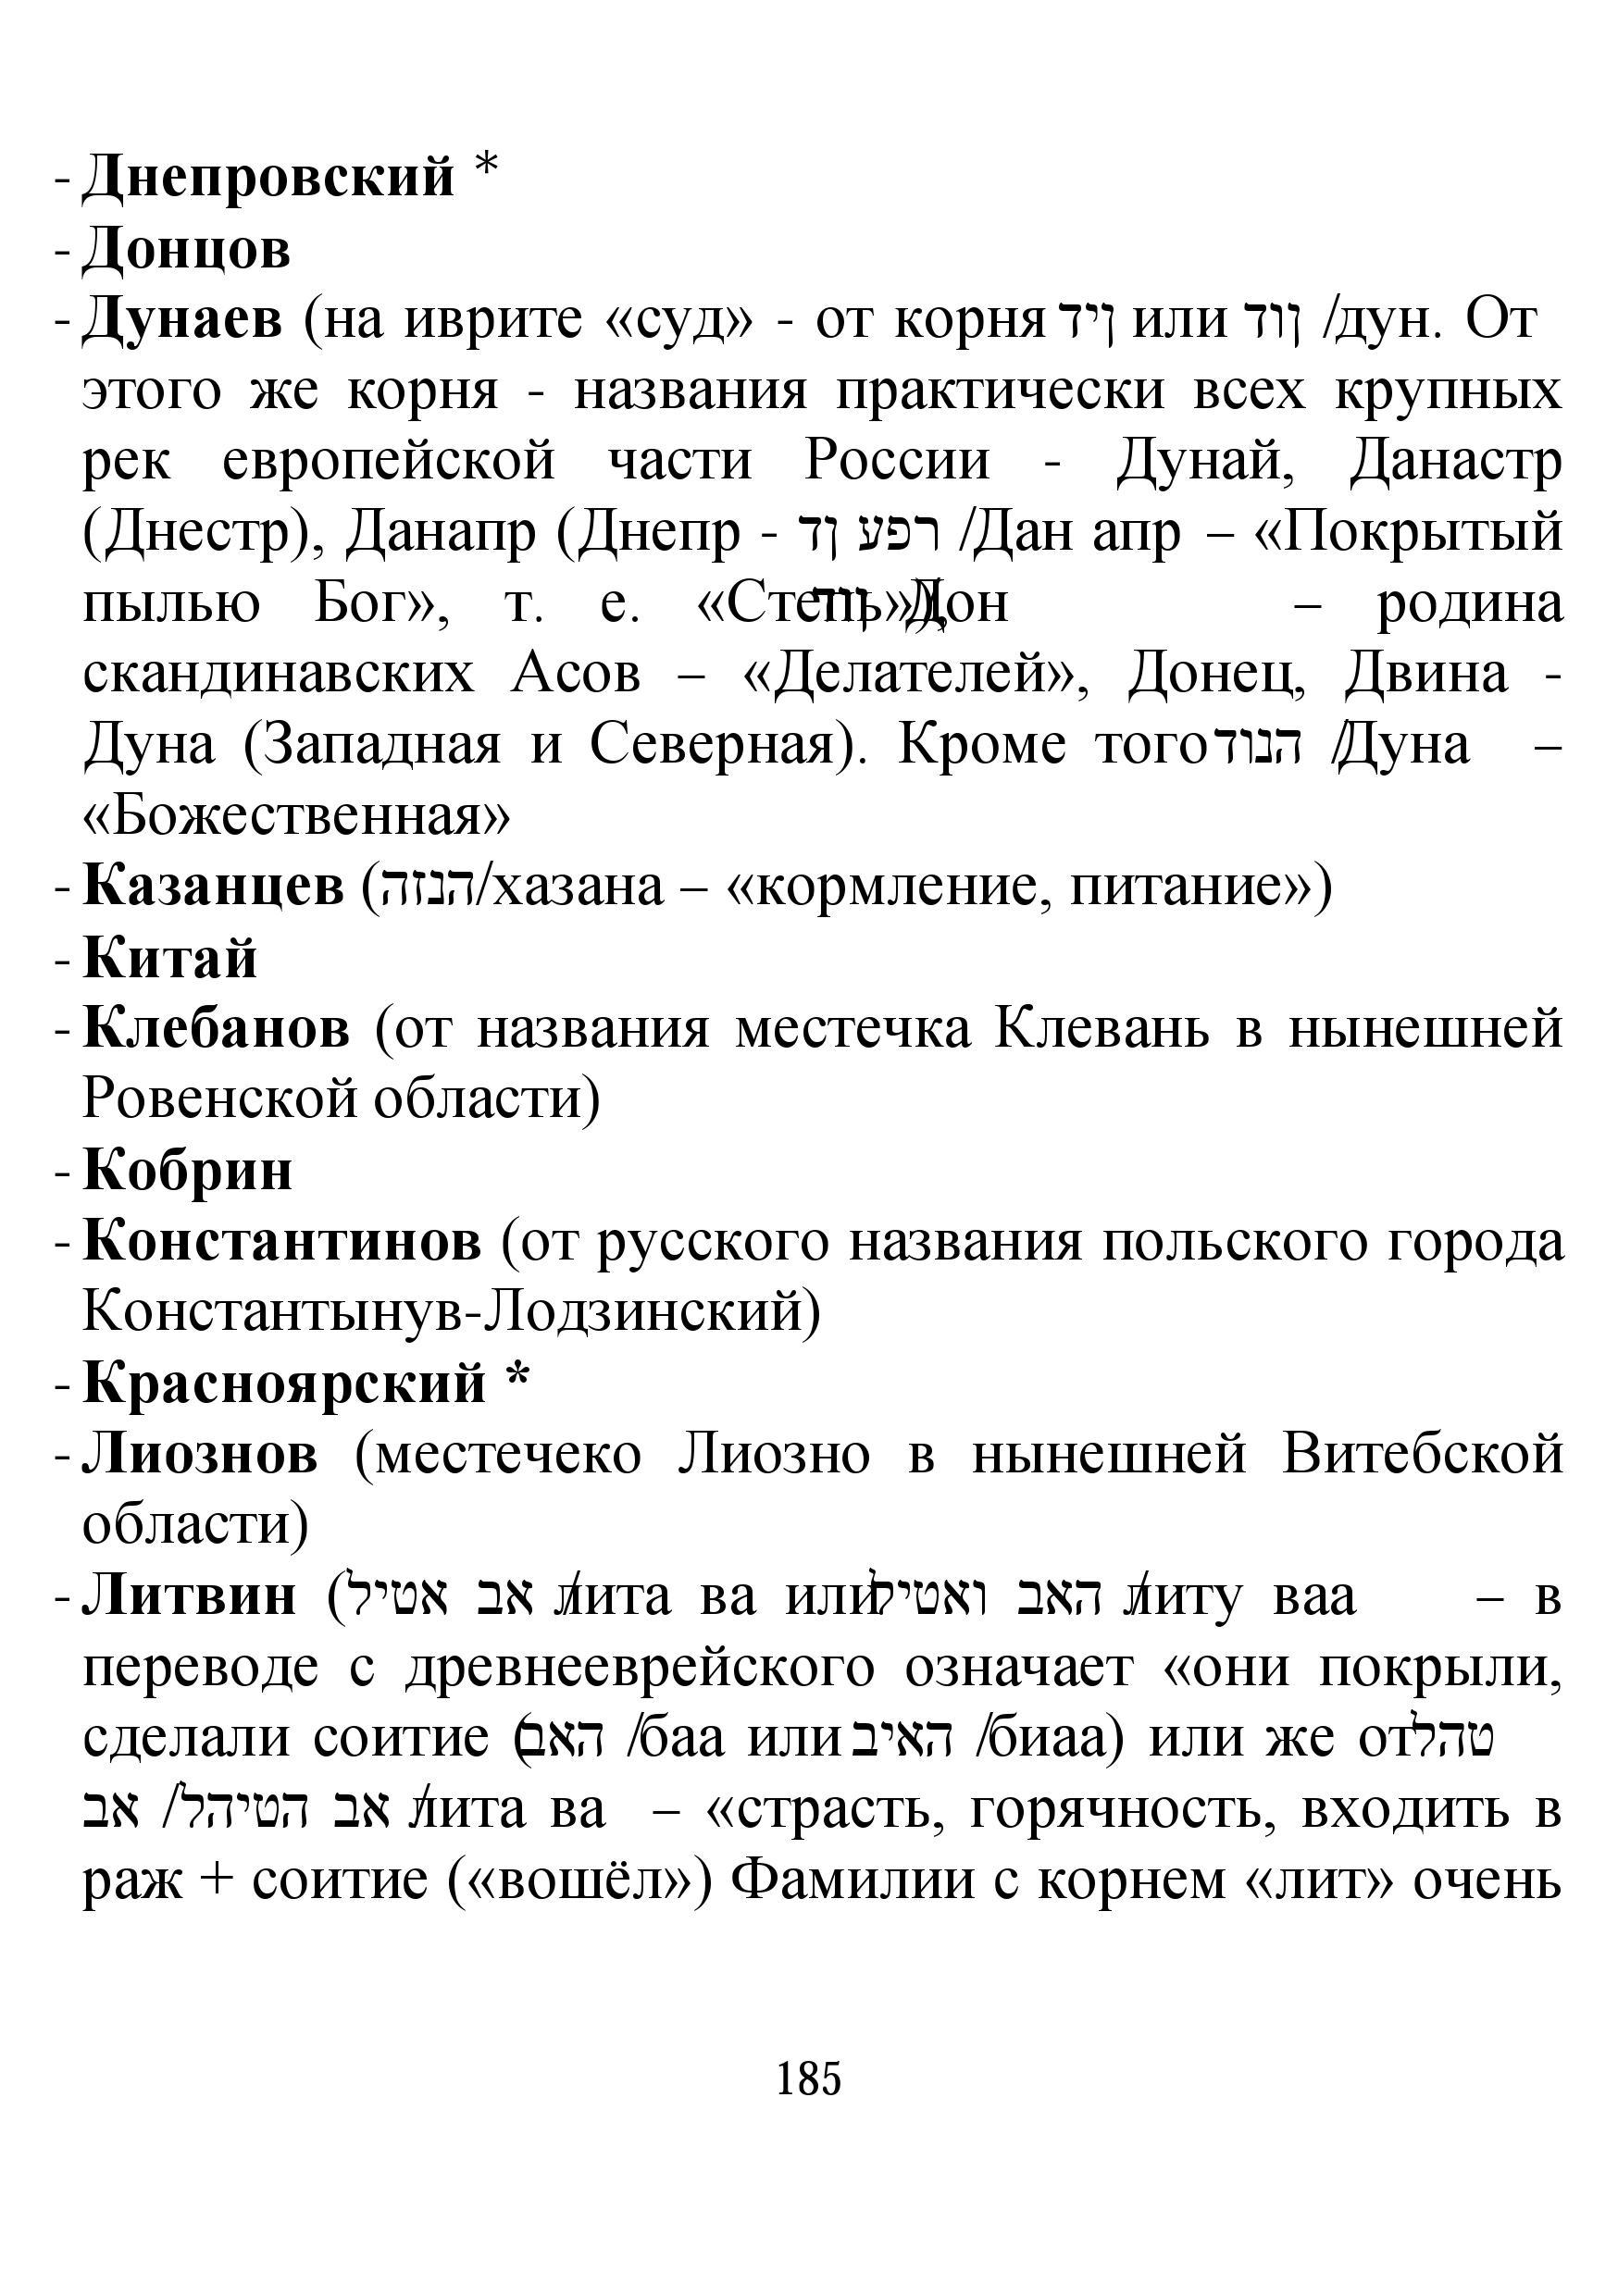 http://se.uploads.ru/sEIGh.jpg